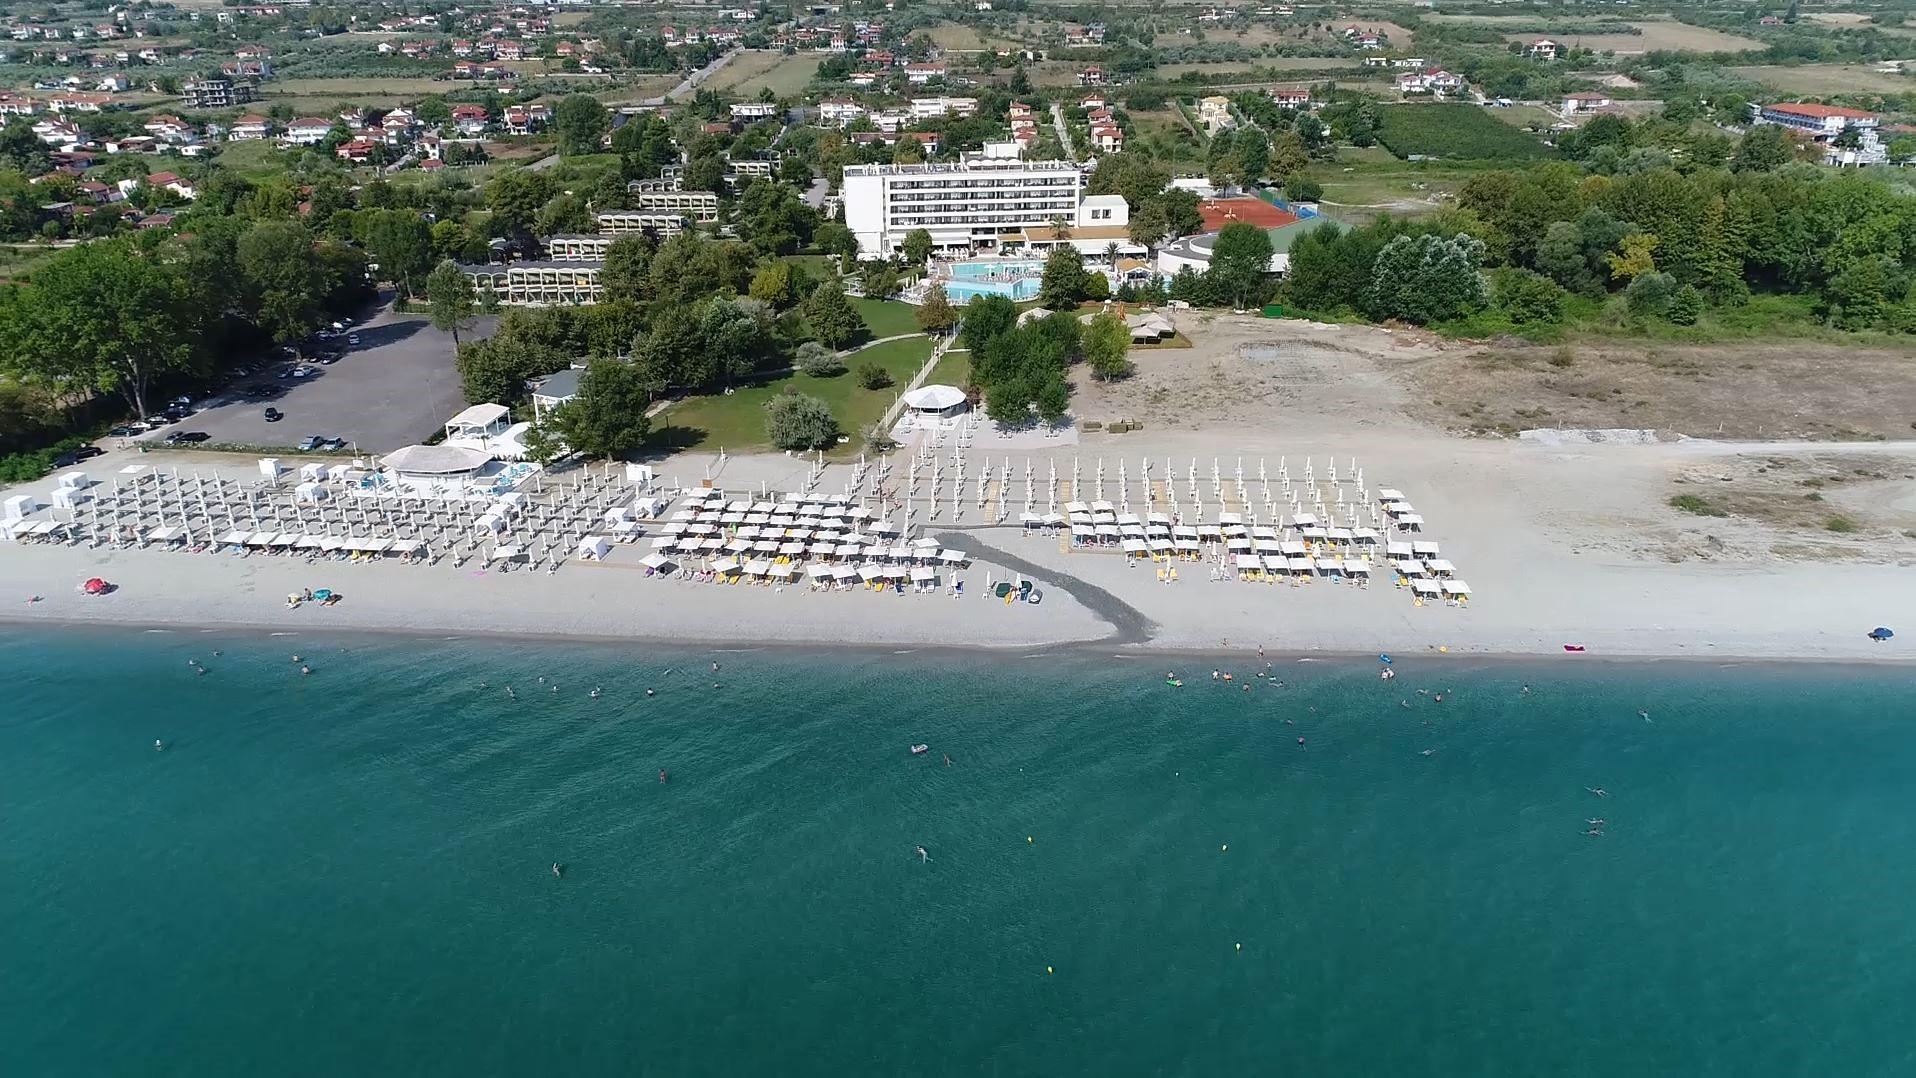 4* Bomo Olympus Grand Resort - Λεπτοκαρυά Πιερίας ✦ -40% ✦ 3 Ημέρες (2 Διανυκτερεύσεις) ✦ 2 άτομα + 1 παιδί έως 12 ετών ✦ All Inclusive ✦ 13/09/2021 έως 31/10/2021 ✦ Ξαπλώστρες και ομπρέλες στην πισίνα και στην παραλία